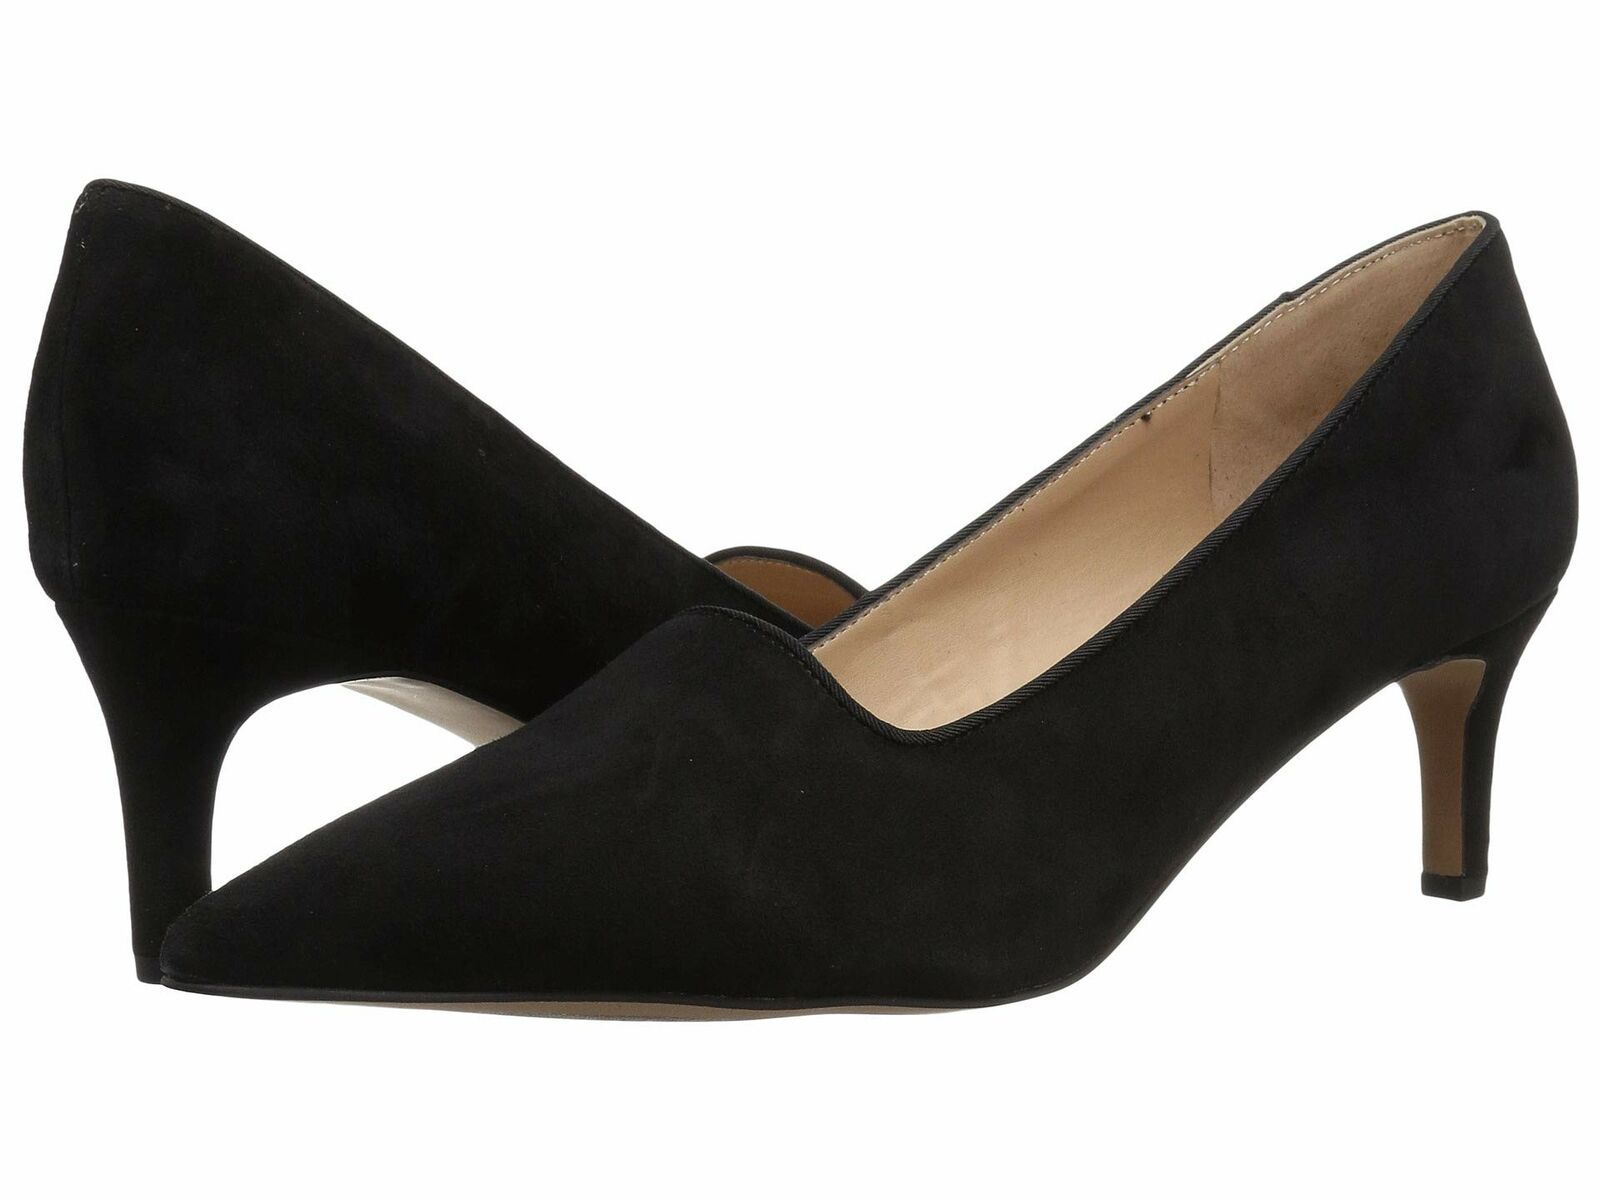 Franco Sarto US 7.5 EU 37.5 Womens Danelly Black Slip On Heels shoes Flats New